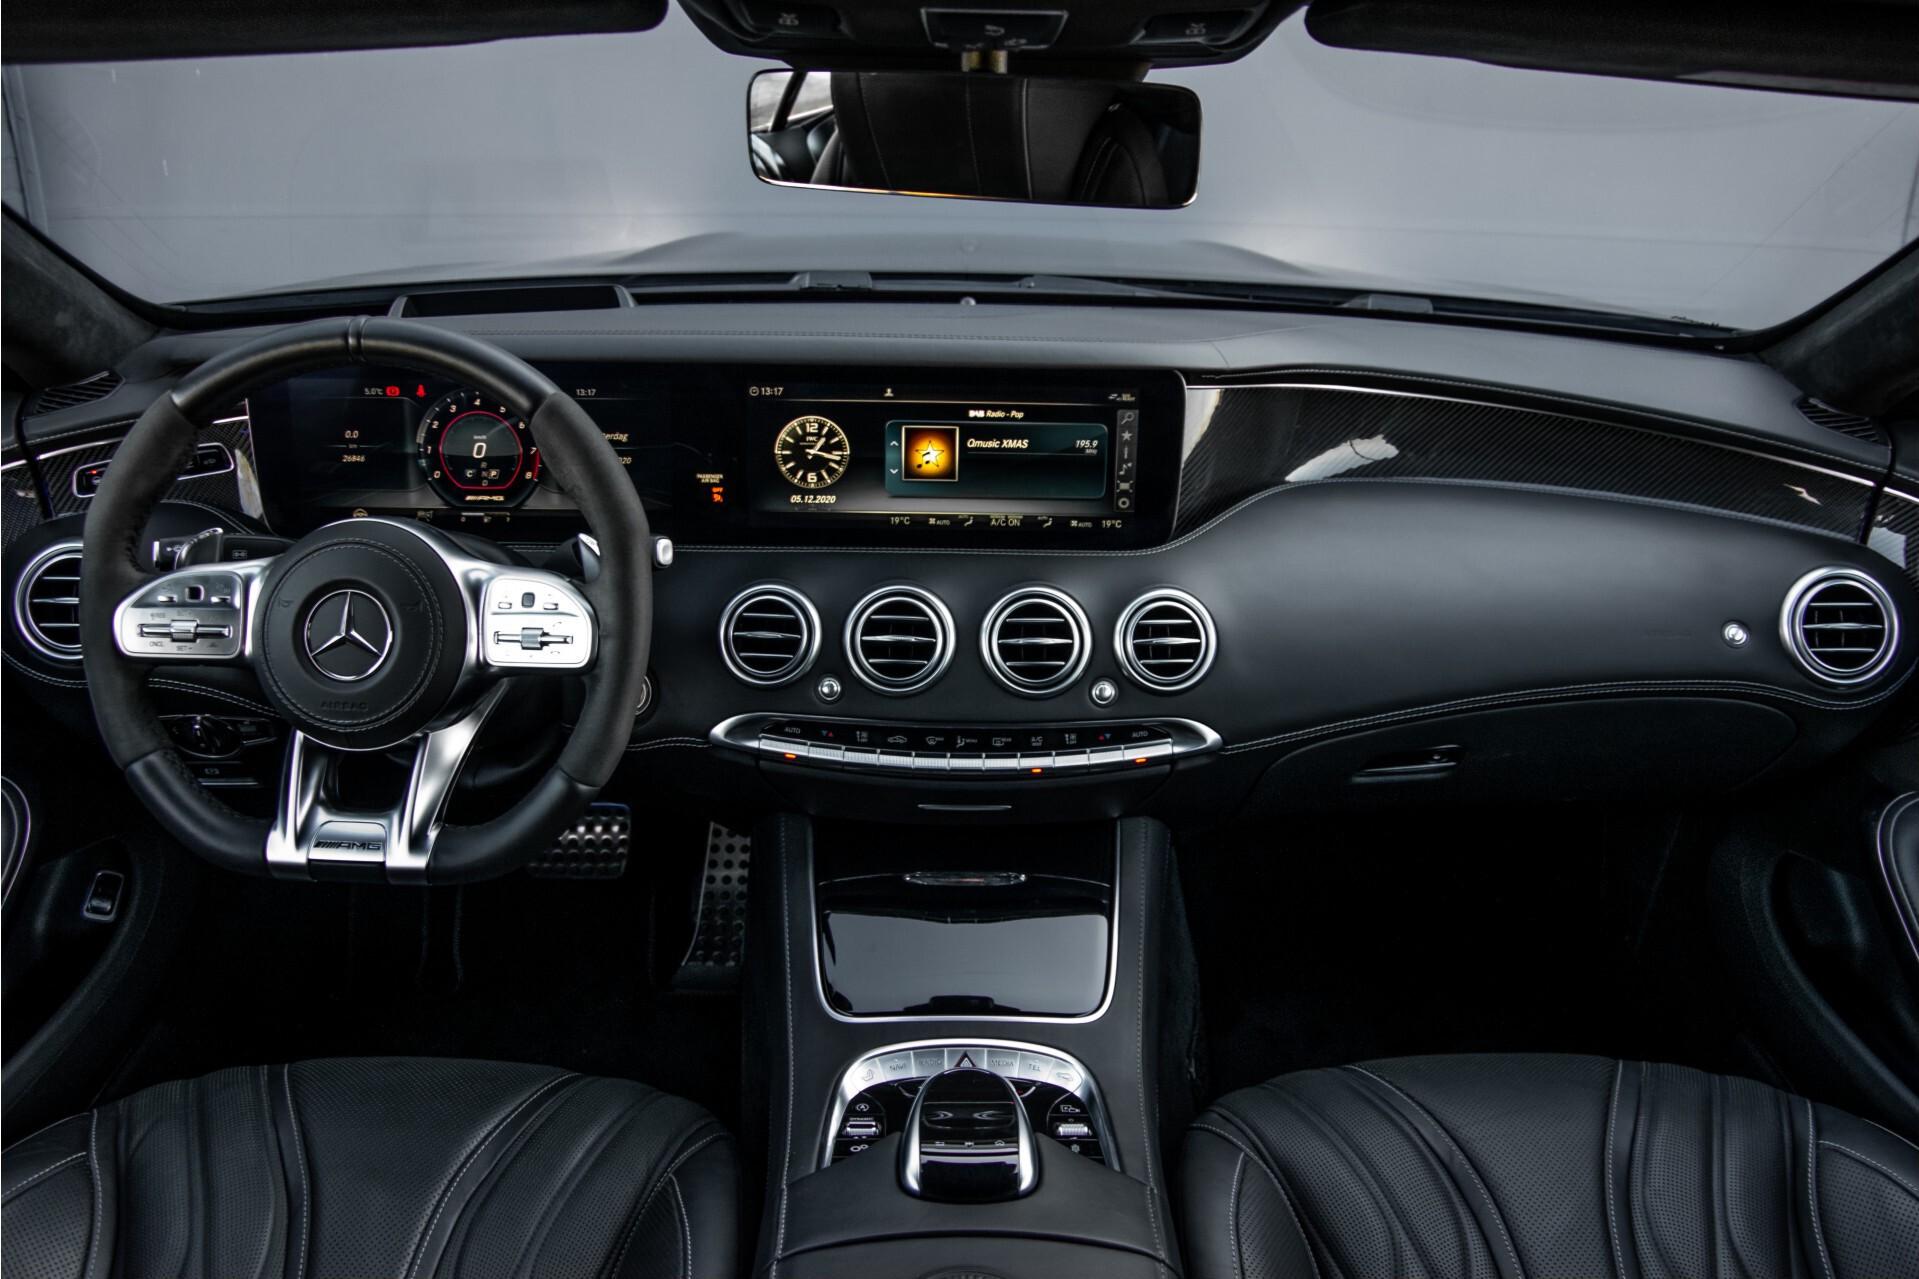 Mercedes-Benz S-Klasse Cabrio 63 AMG 4M+ Keramisch/Burmester High End 3D/Carbon/Driverspack/Blackpack Aut9 Foto 9